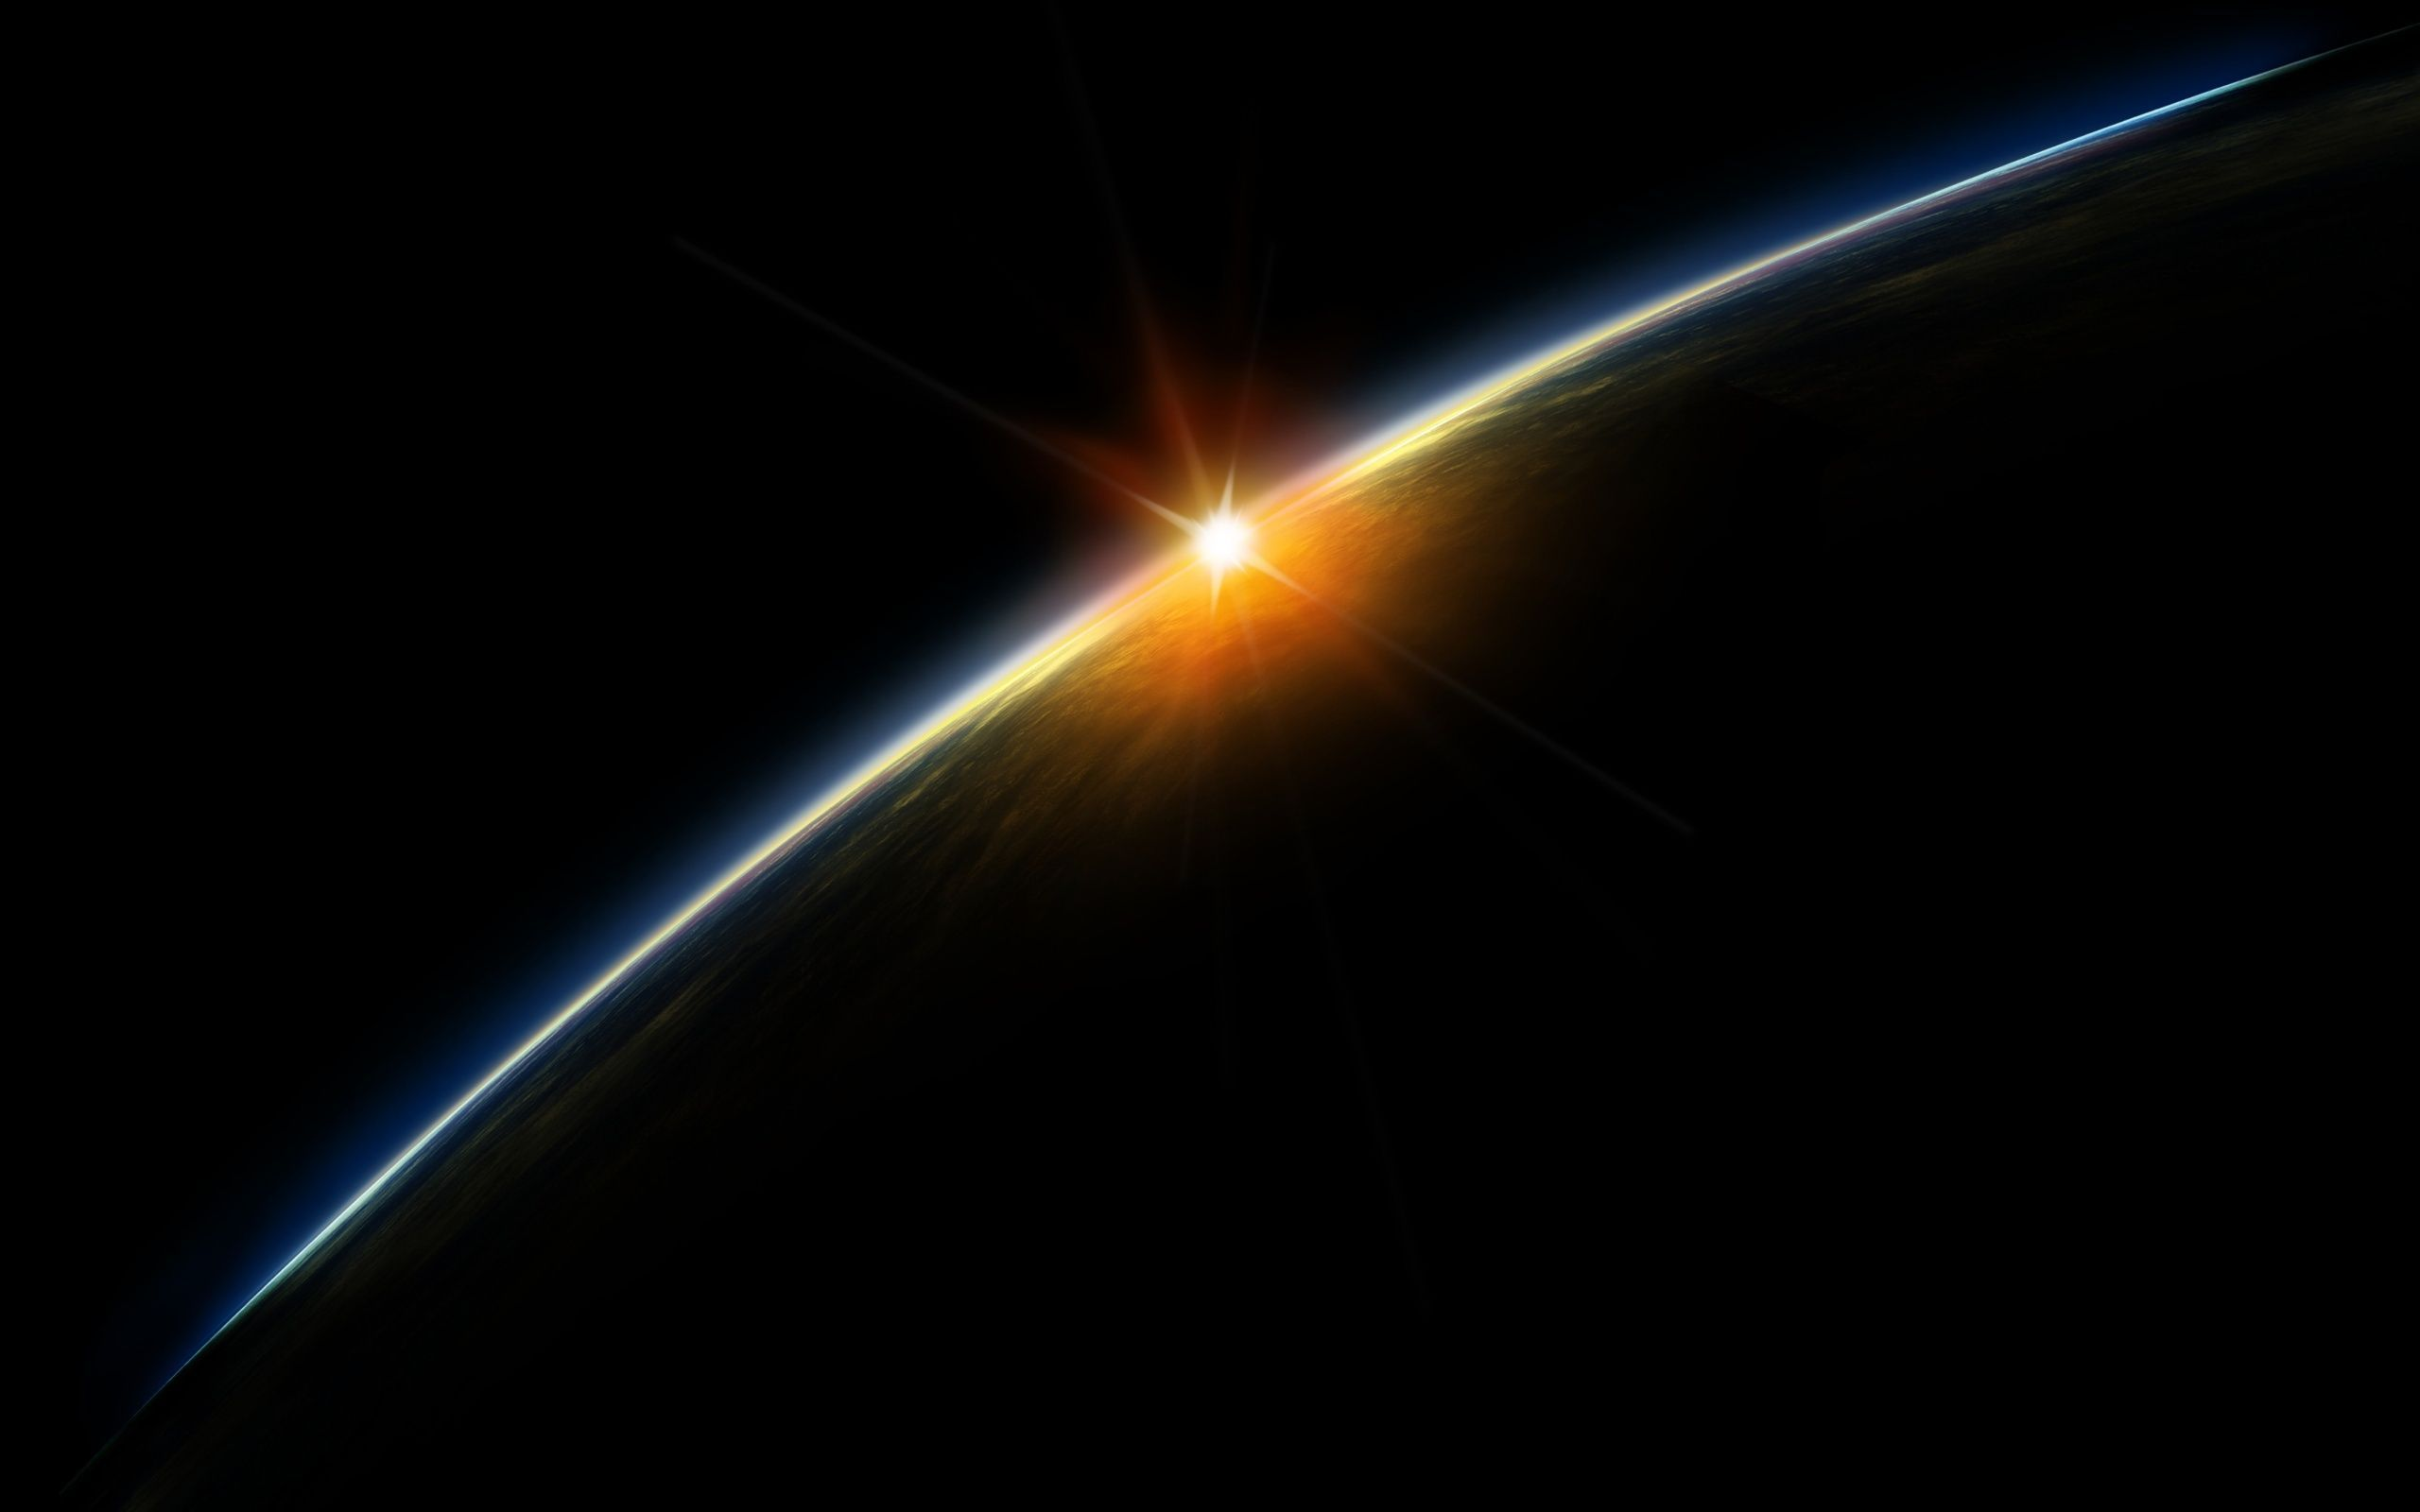 Horizon sun on earth planet el universo de di s pinterest horizon sun on earth planet altavistaventures Images